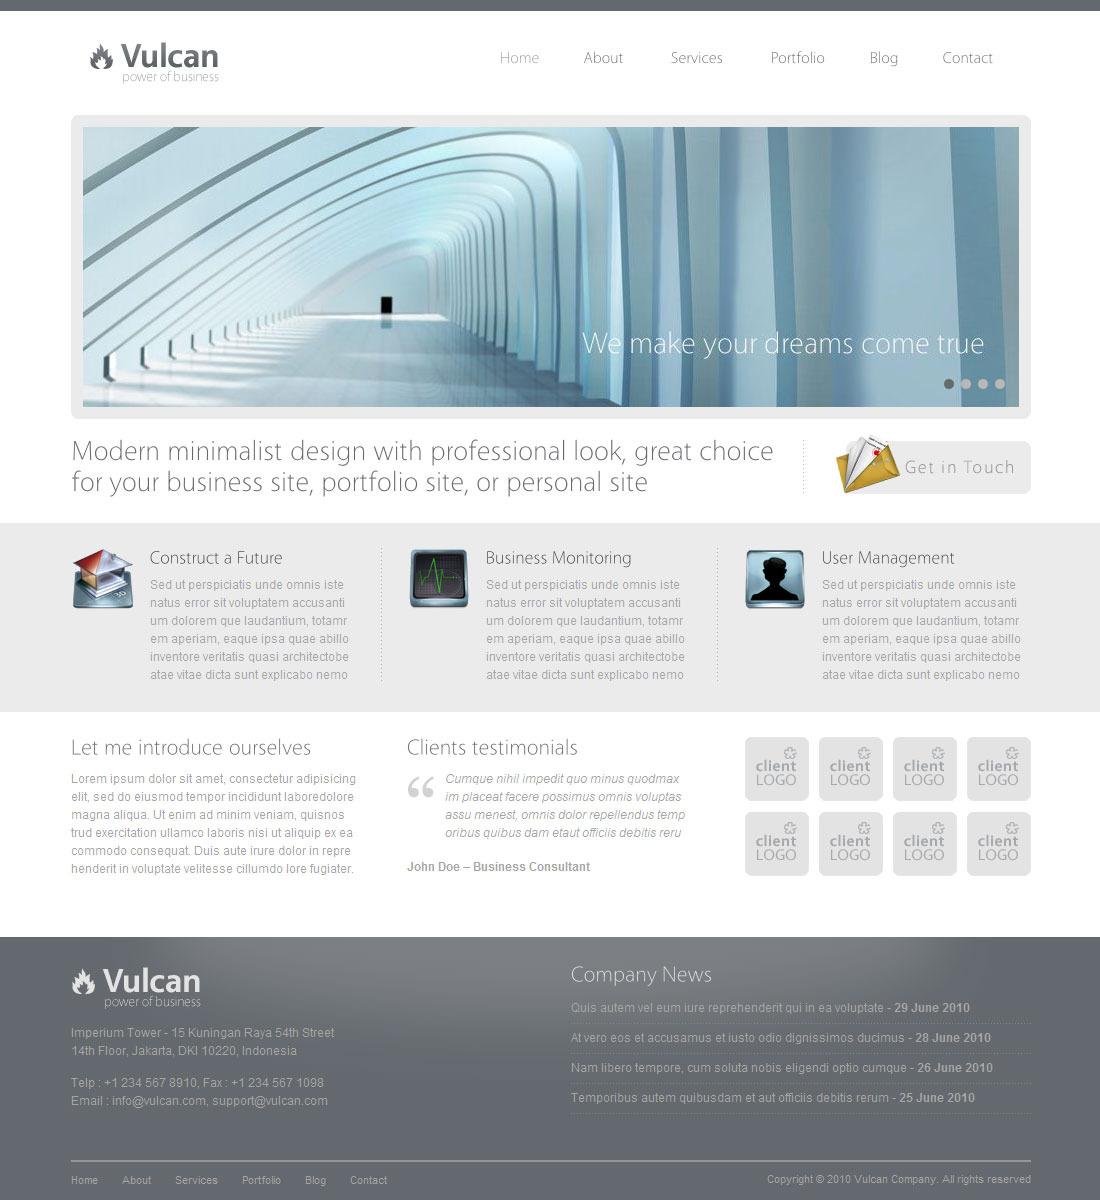 http://3.s3.envato.com/files/38800408/screenshot/02_Vulcan-home.jpg